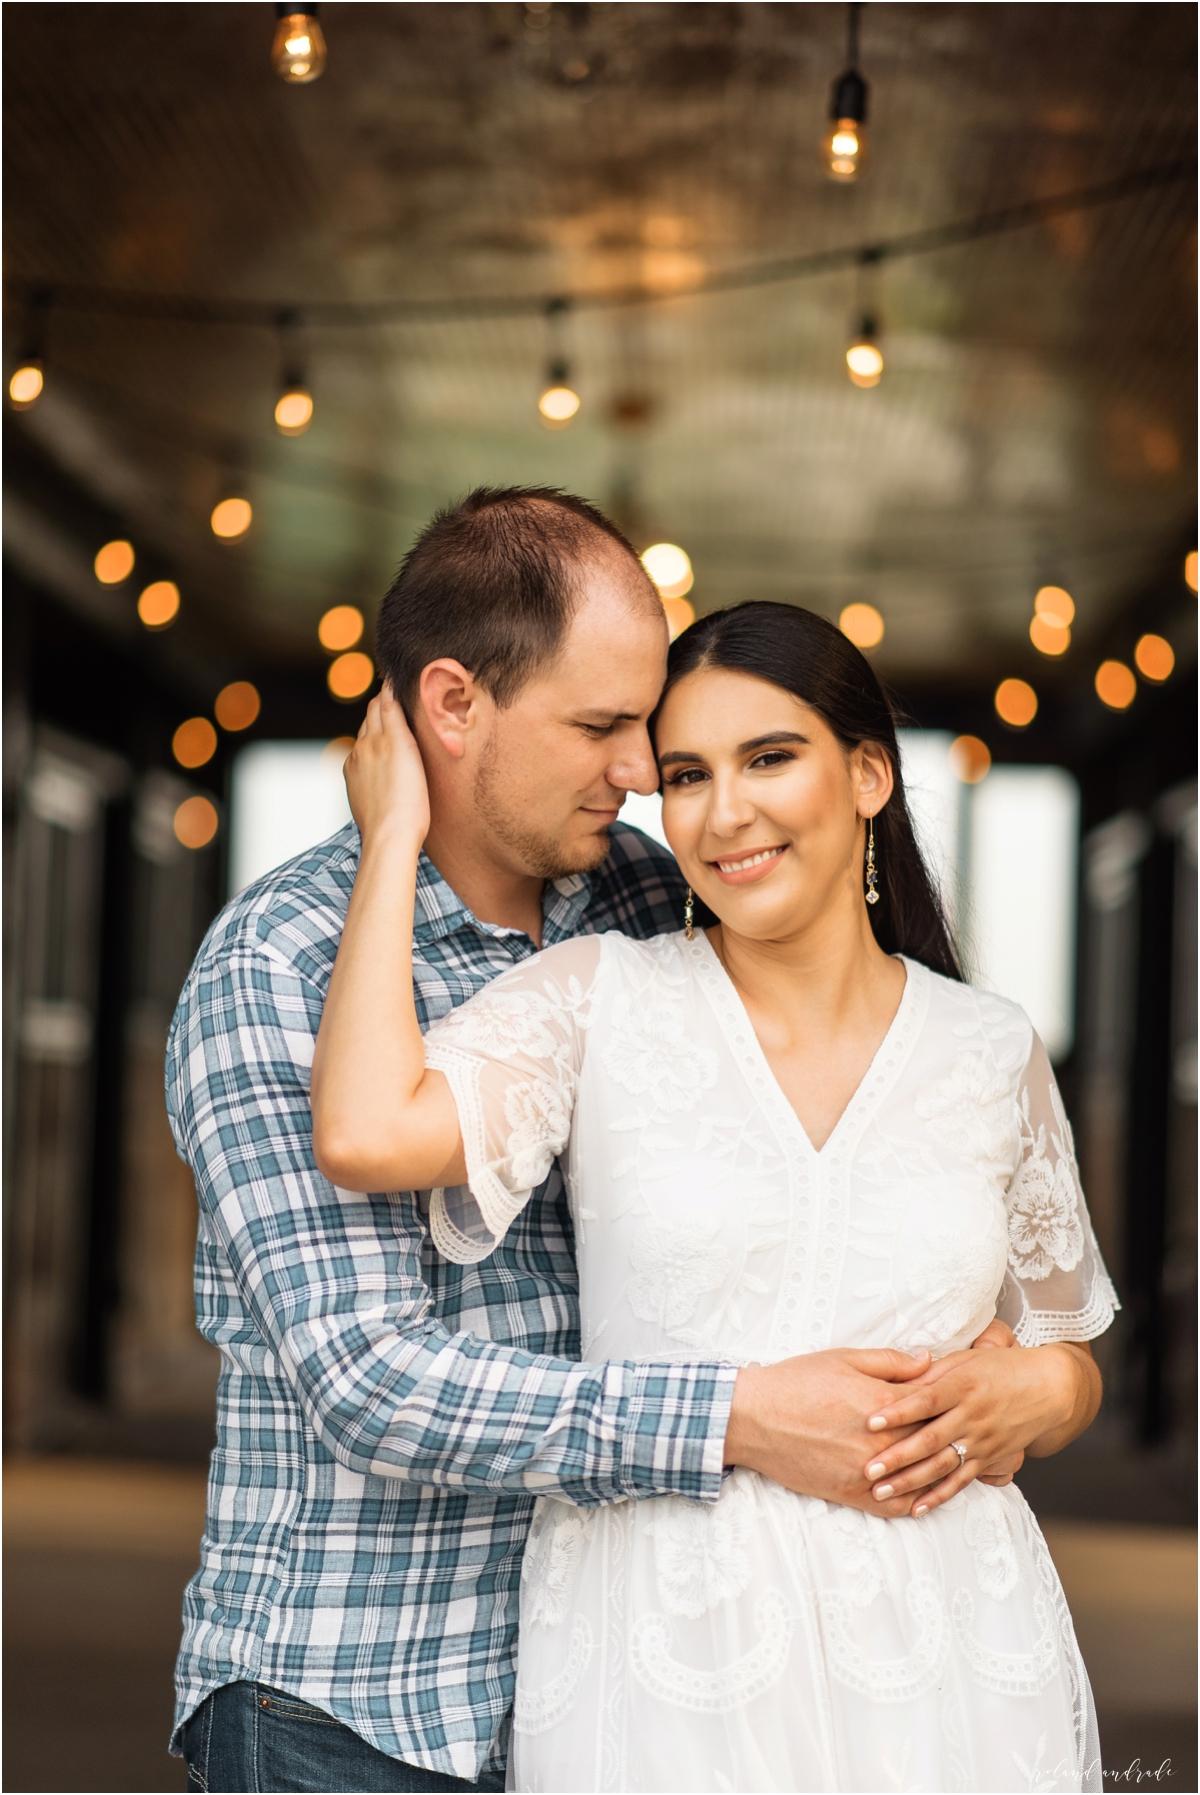 Yesenia + Daniel Northfork Farm Engagement Session Oswego Wedding Photographer Aurora Wedding Photographer16.jpg